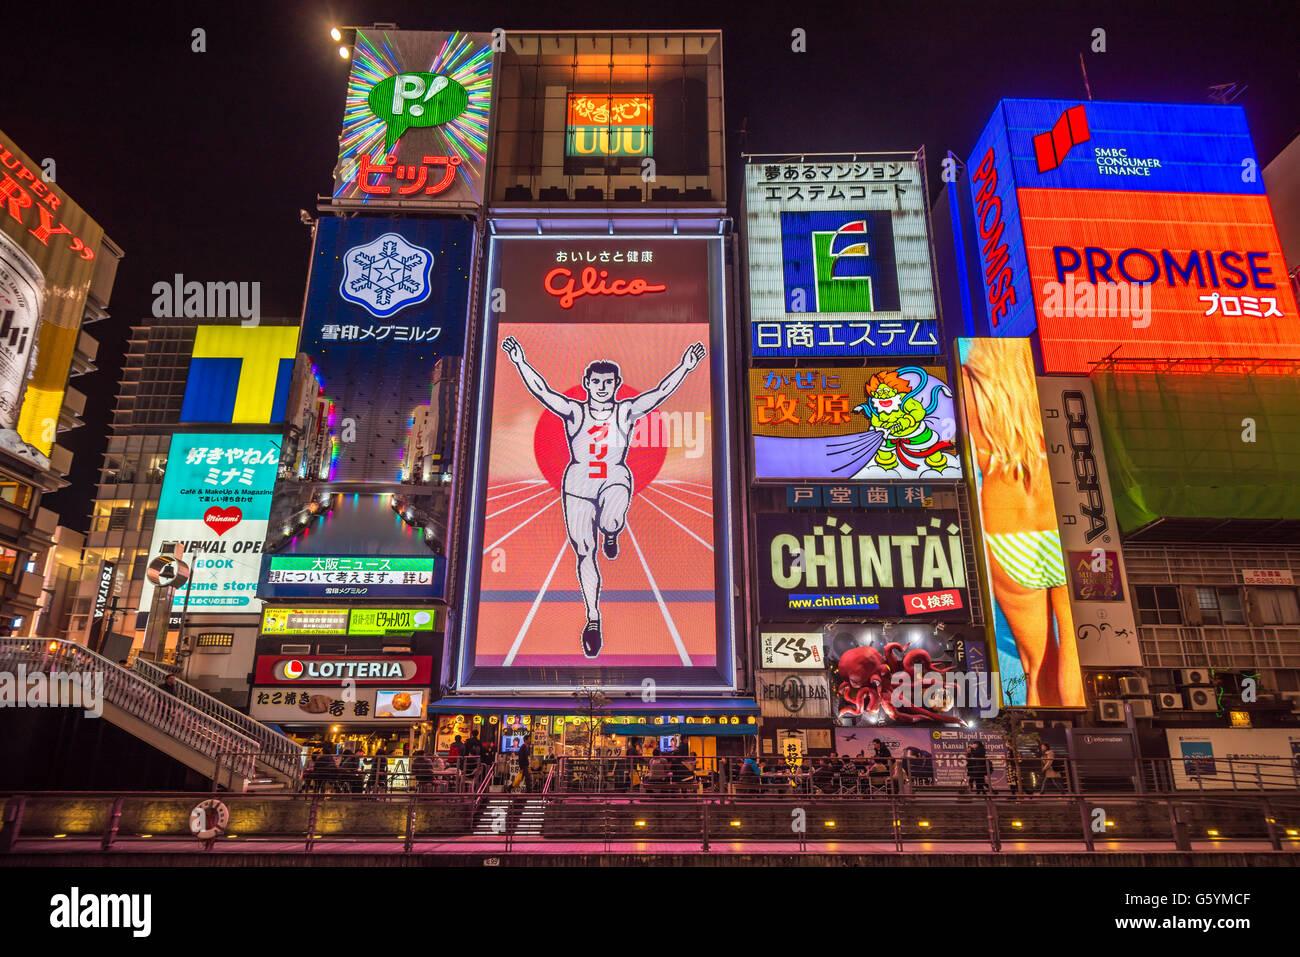 OSAKA, JAPON - 15 novembre, 2014: Glico man neon pancarte dans quartier Dotonbori, Osaka Photo Stock